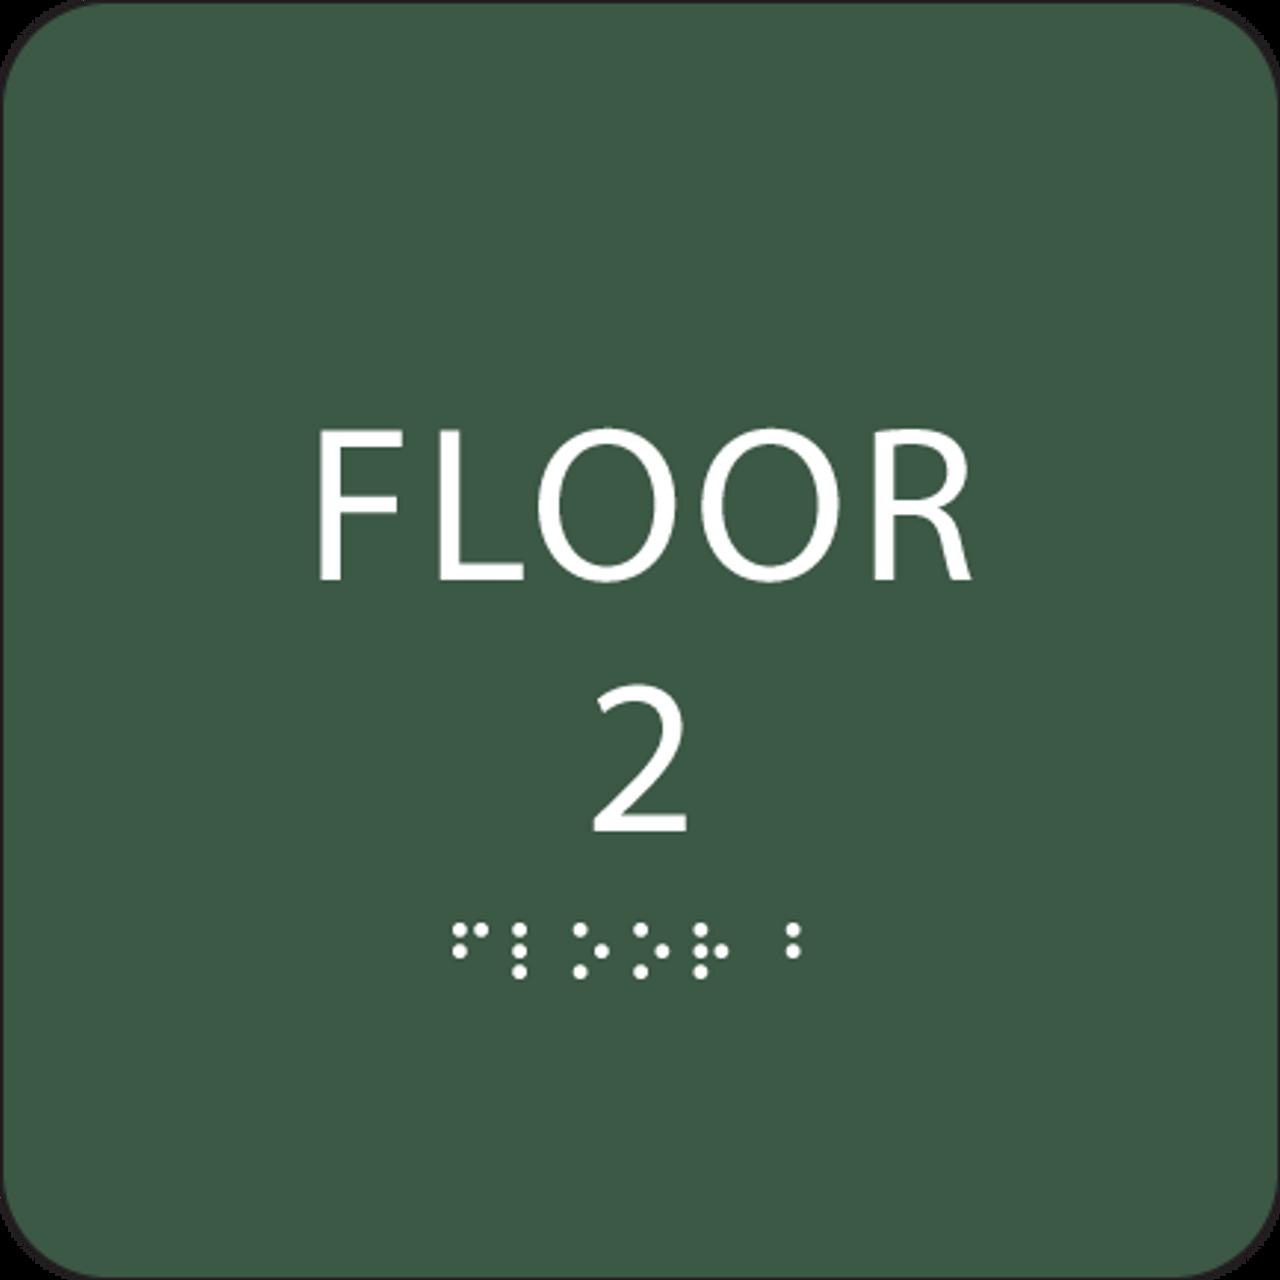 Green Floor 2 Level Sign